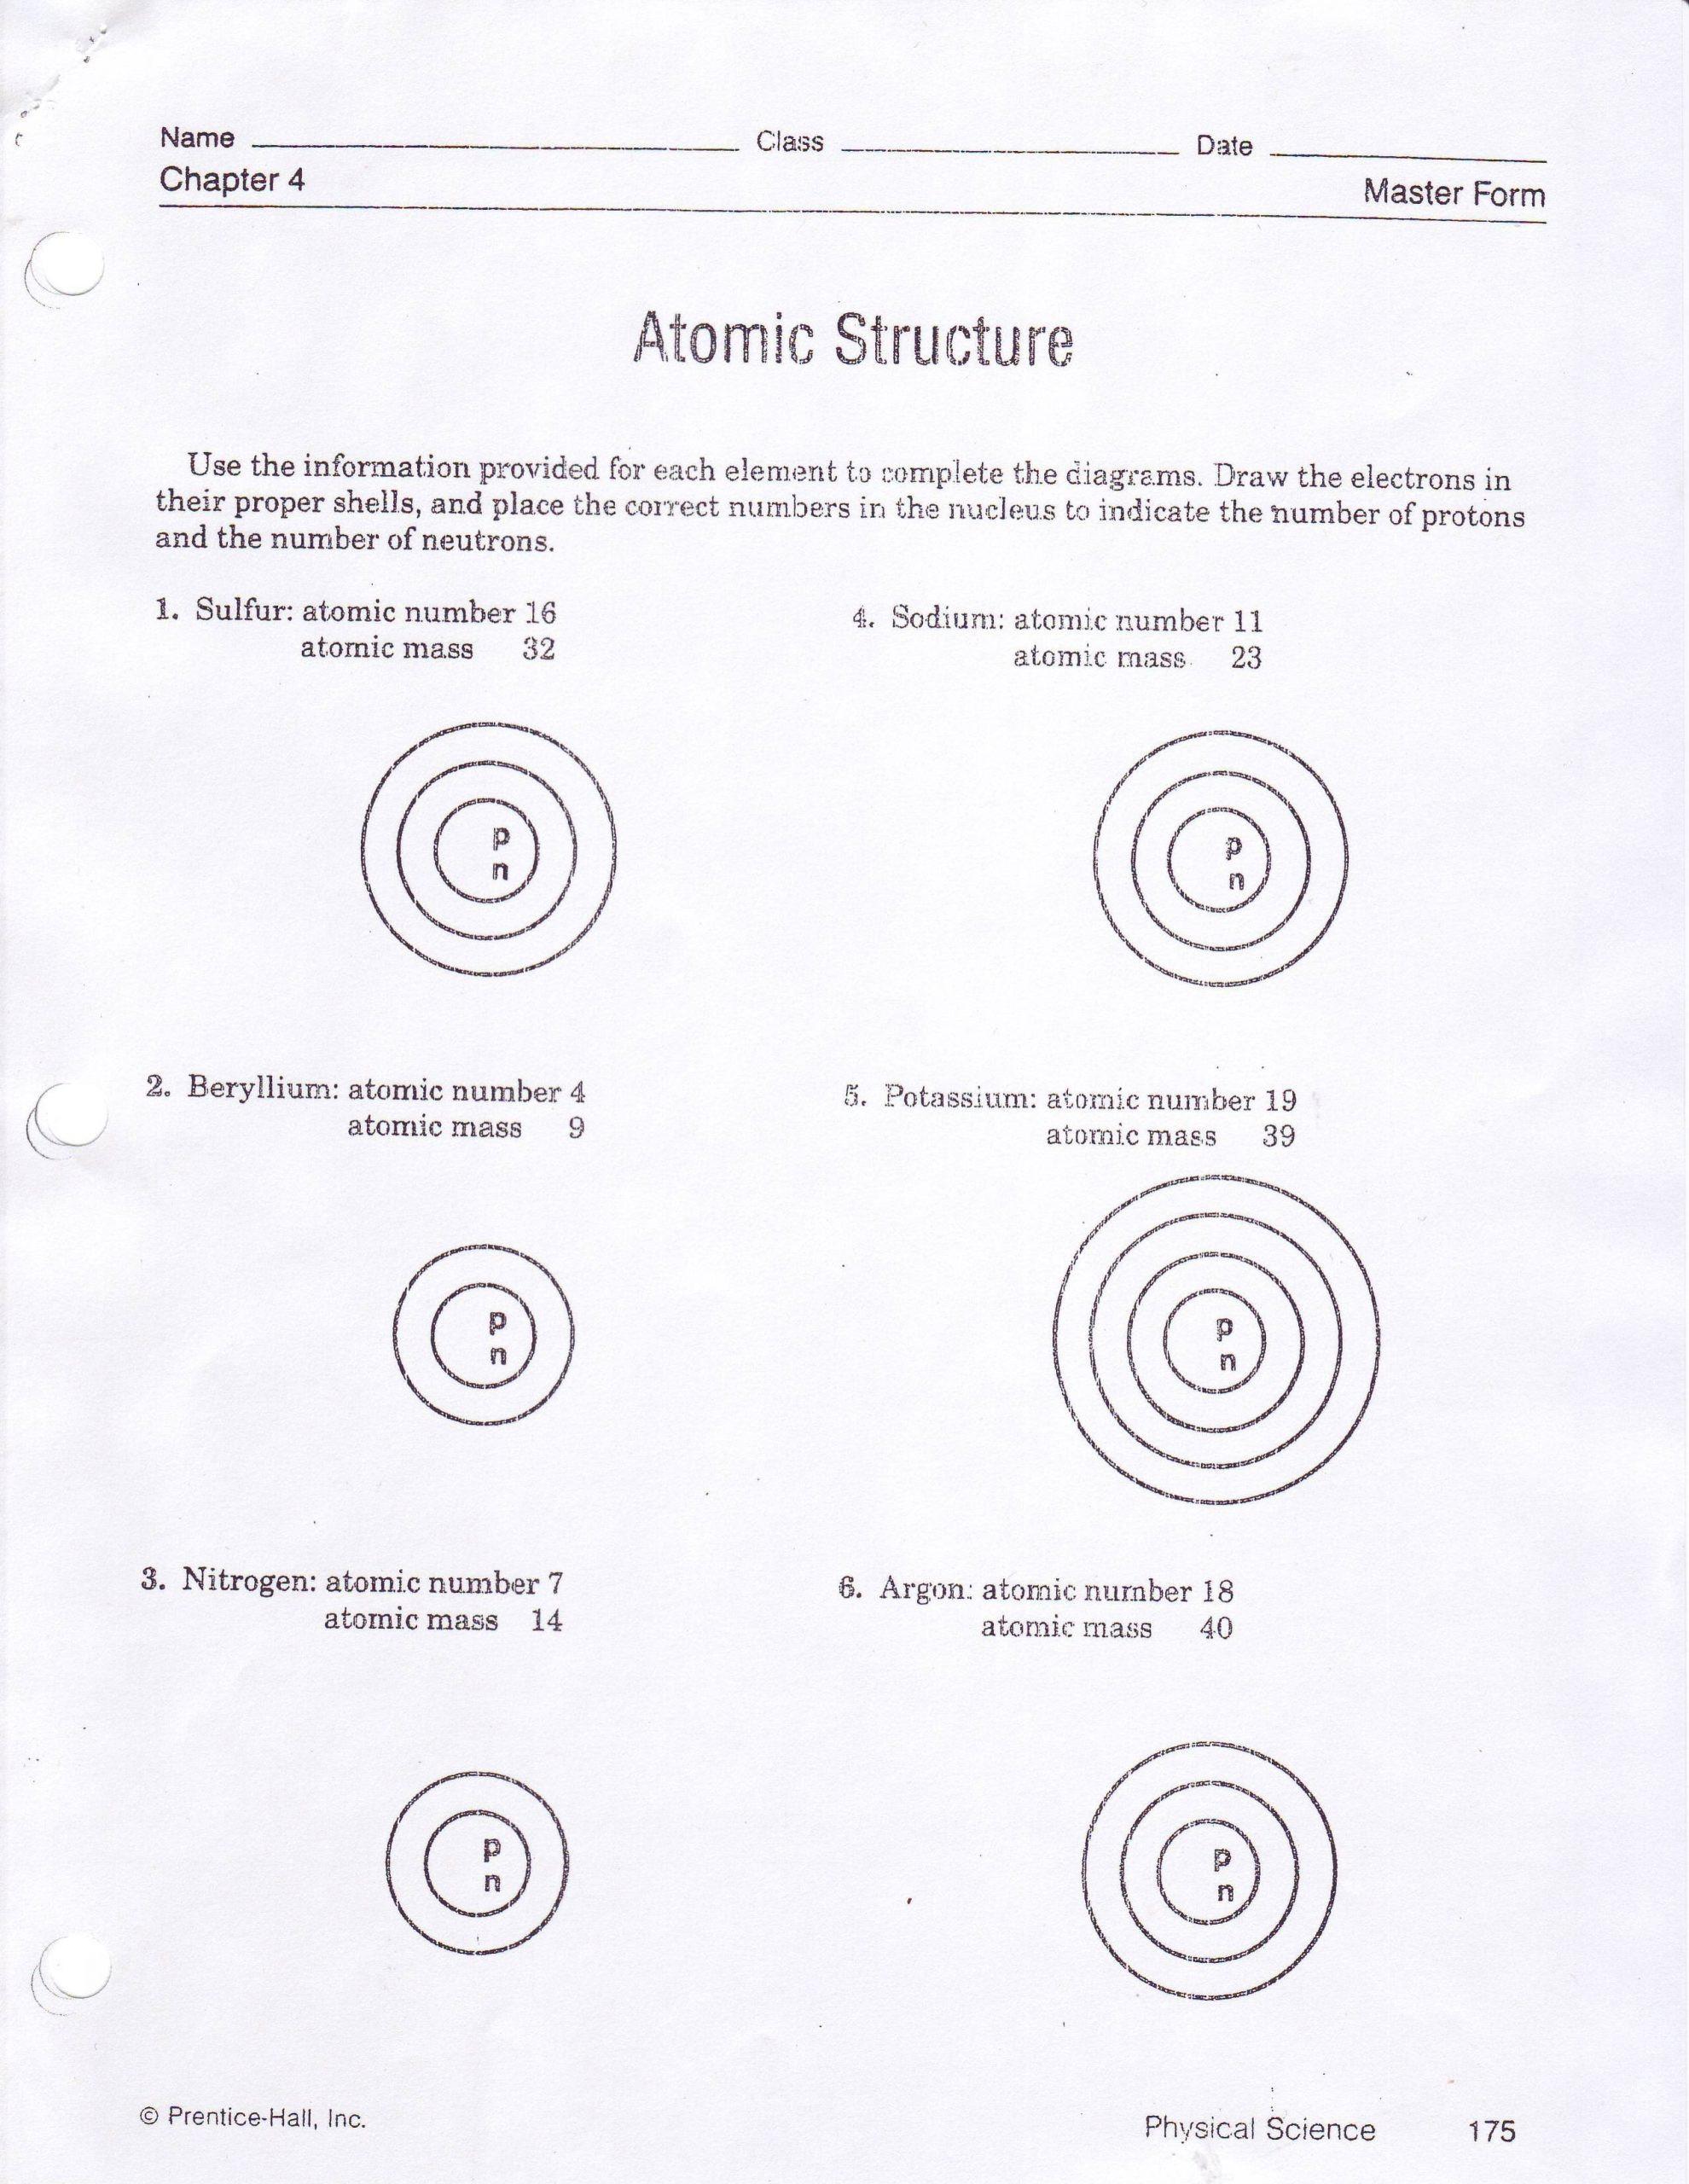 Bohr atomic Models Worksheet Answers Worksheets 42 astonishing atomic Structure Worksheet